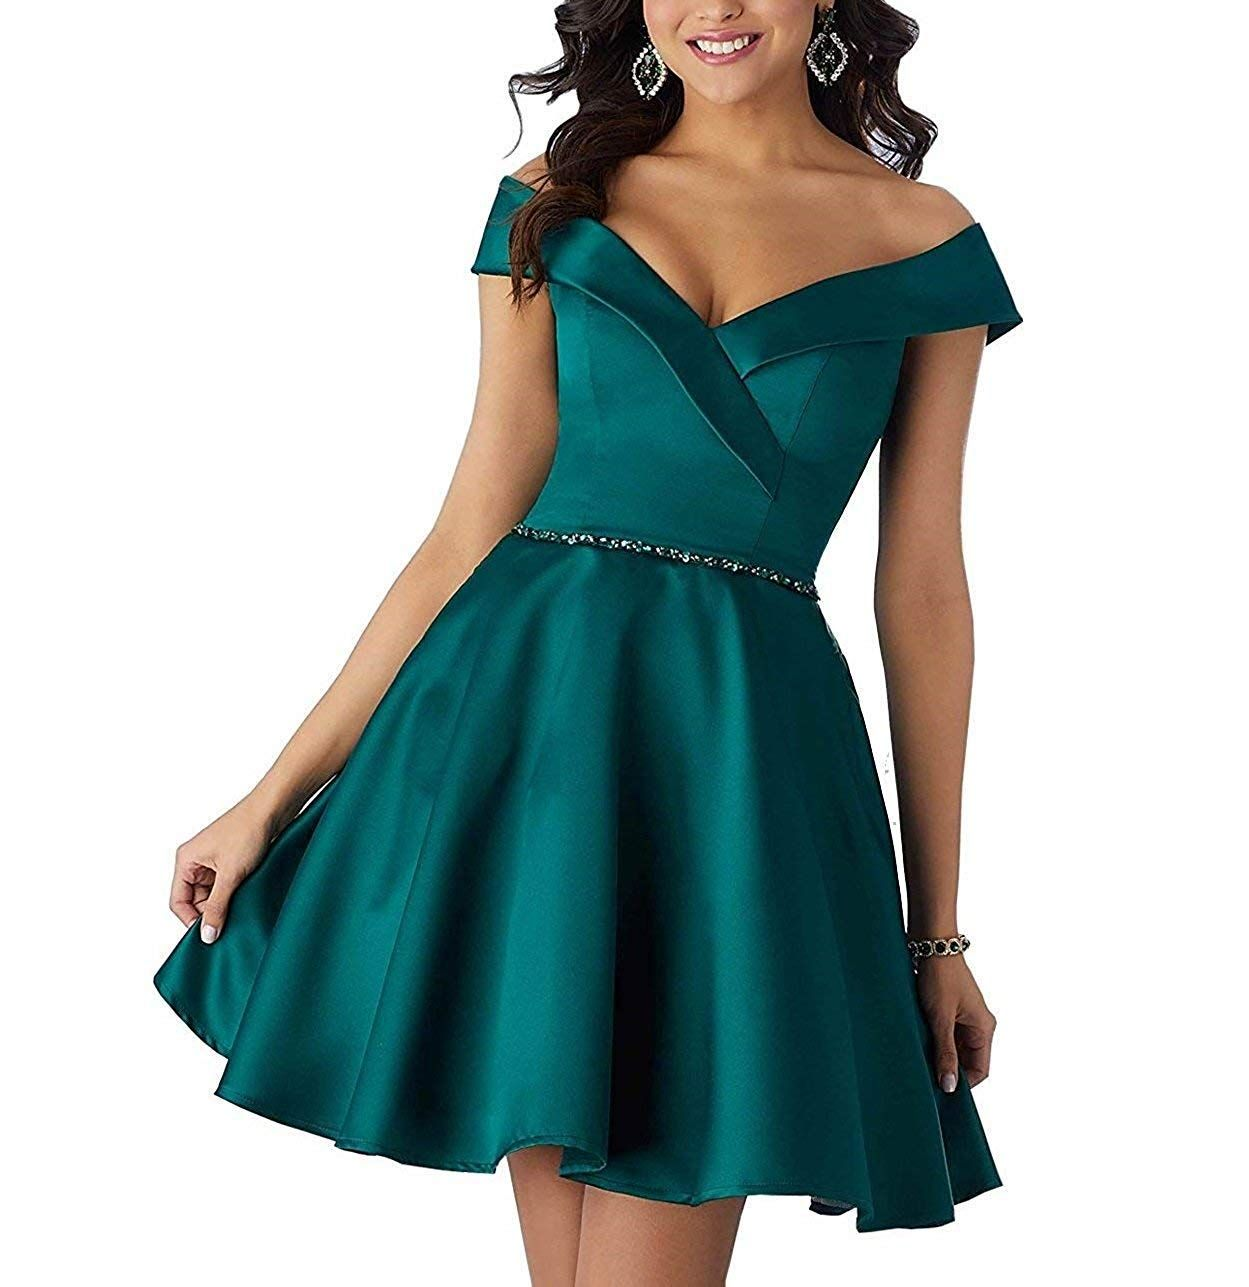 Dress Lace Up Dress Sleeveless V Neck Women Party Off Shoulder